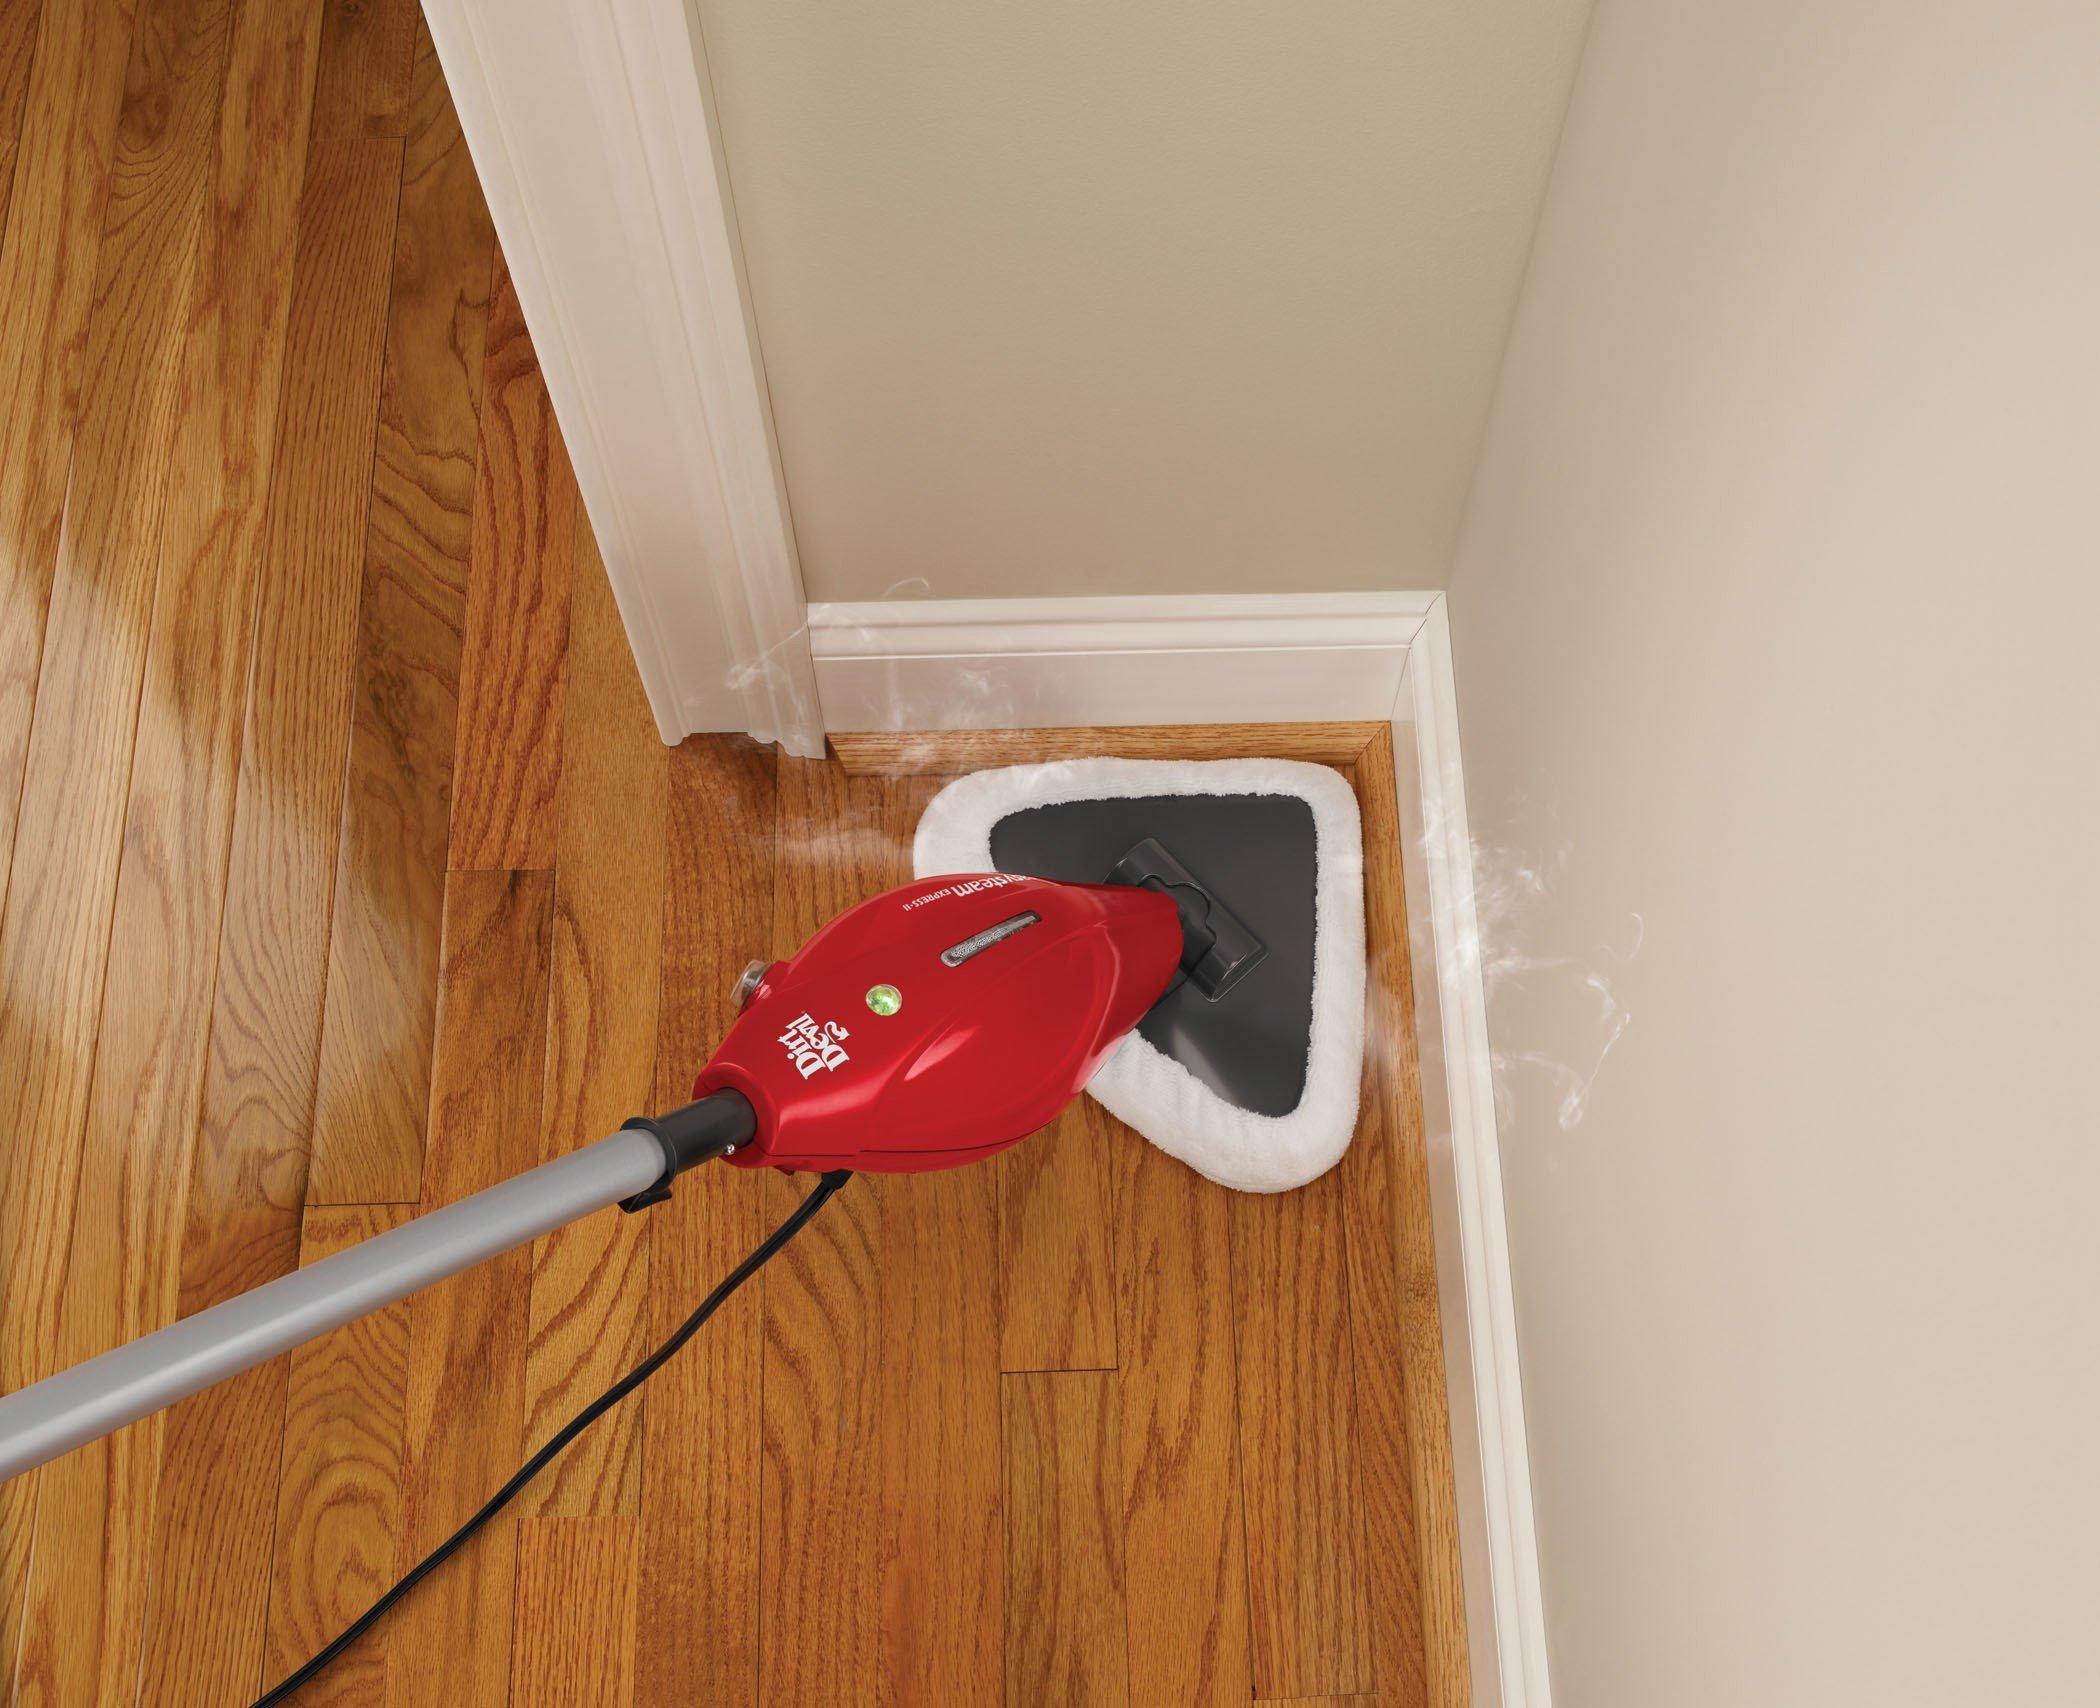 Easy Steam Express II Hard Floor Cleaner3